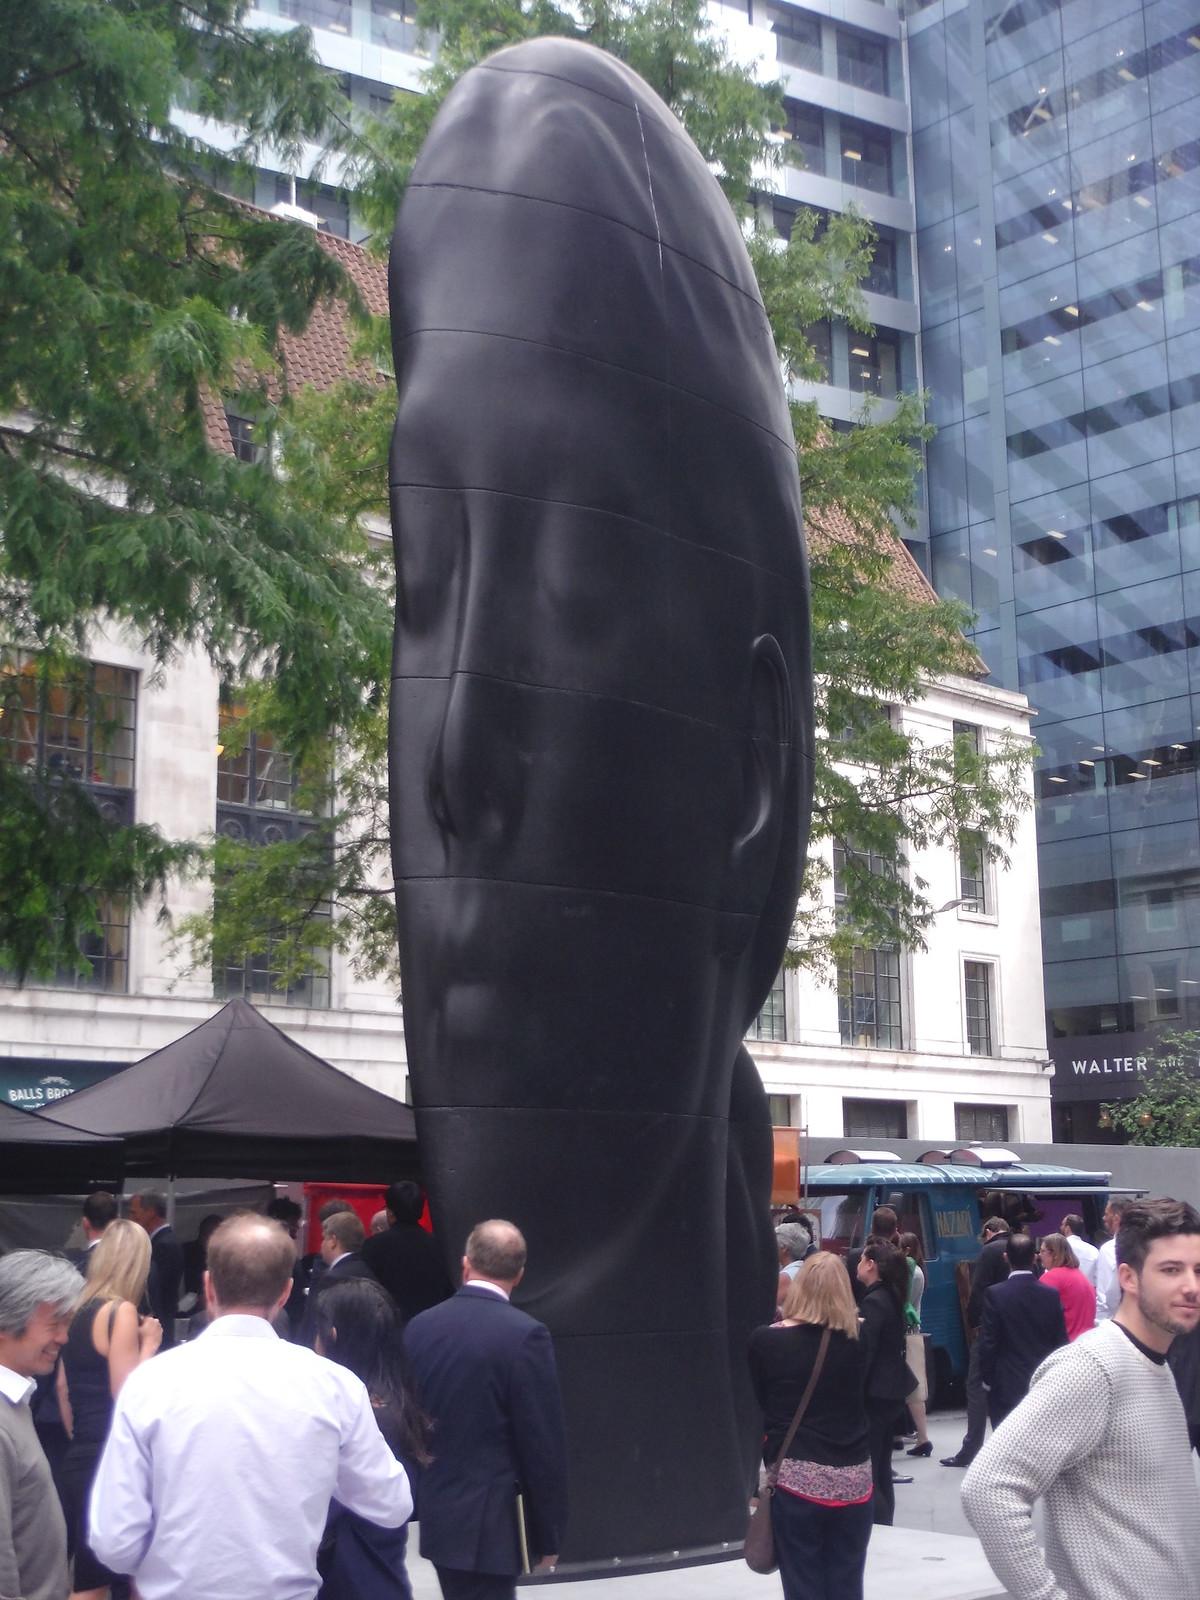 Jaume Plensa - Laura SWC Walk Short 24 - Sculpture in the City